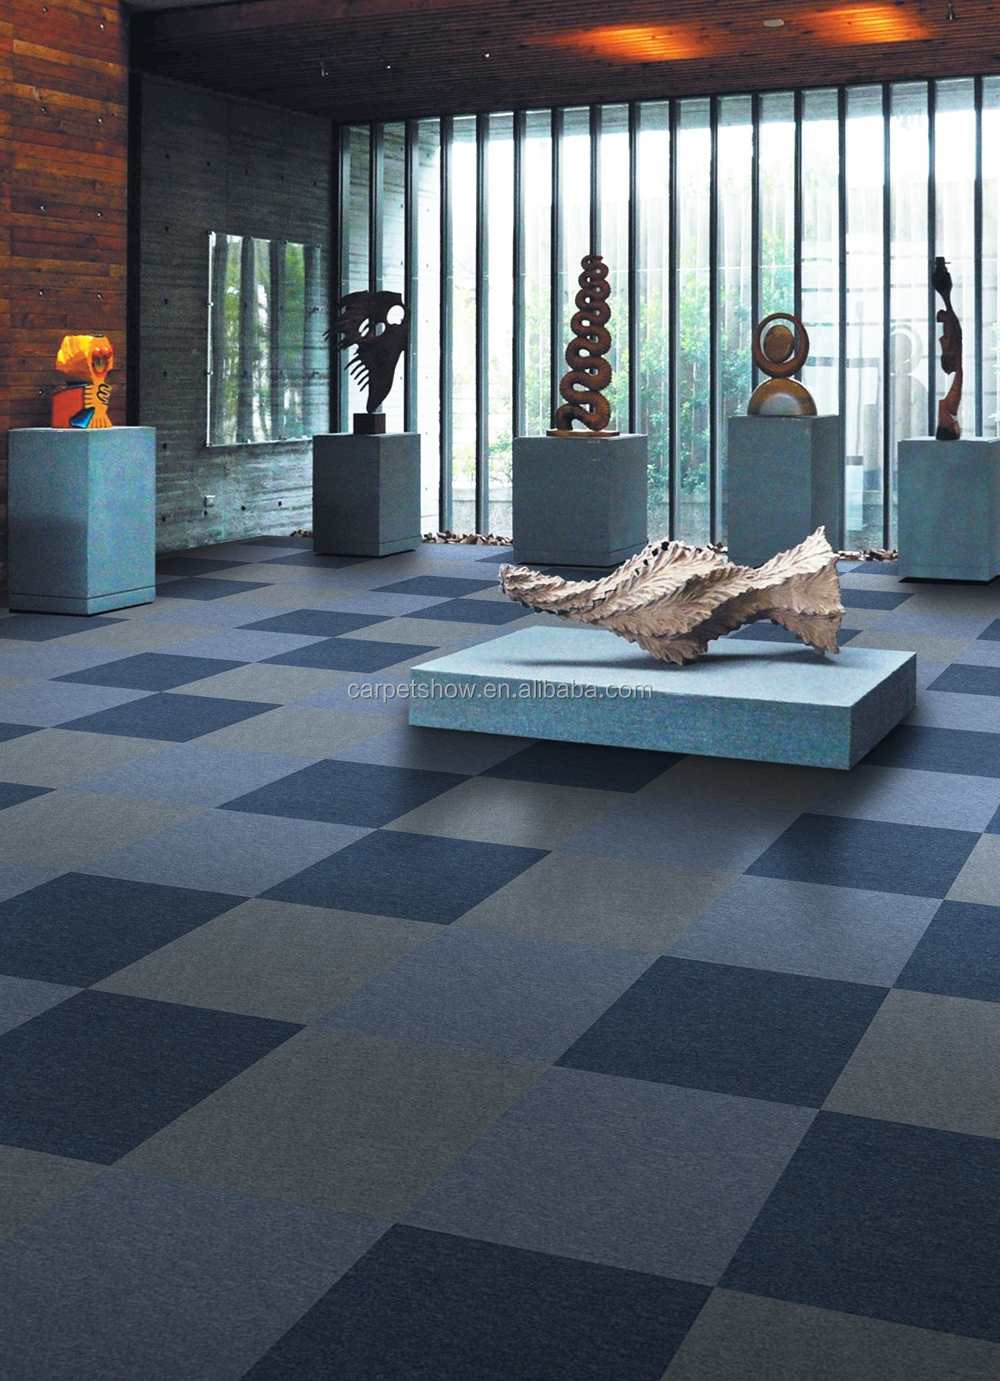 Kerala floor carpet tile banquet carpet pp carpet tile buy kerala floor carpet tile banquet carpet pp carpet tile dailygadgetfo Choice Image